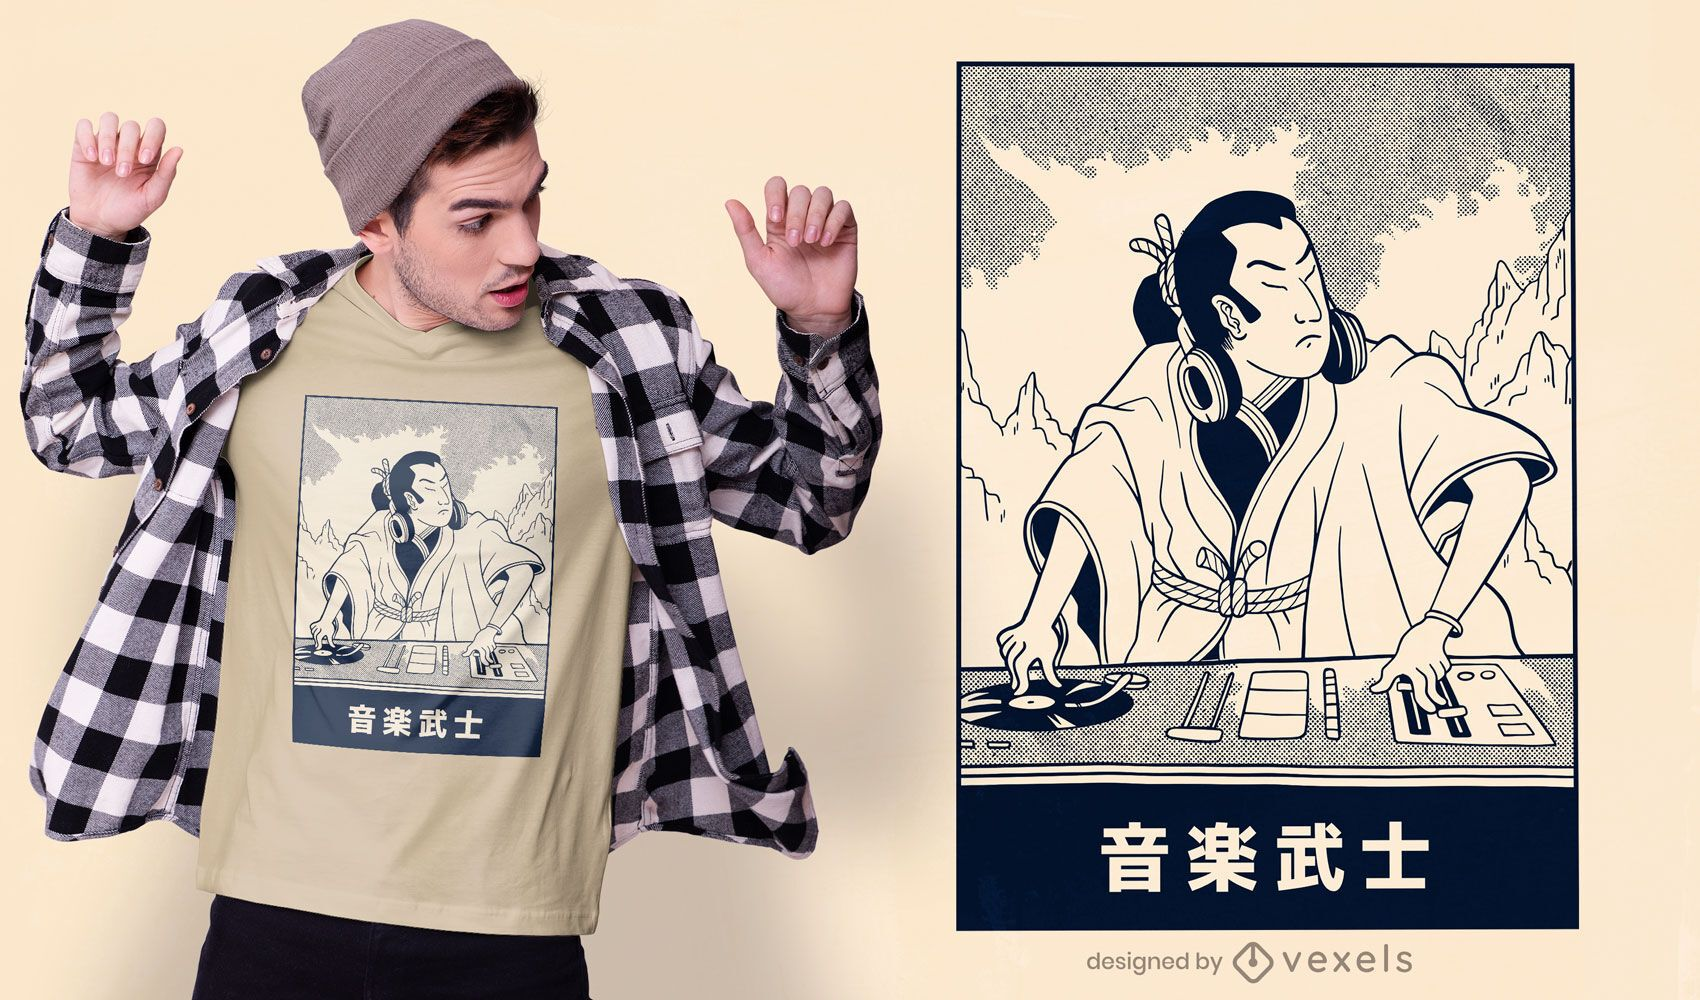 Samurai dj t-shirt design